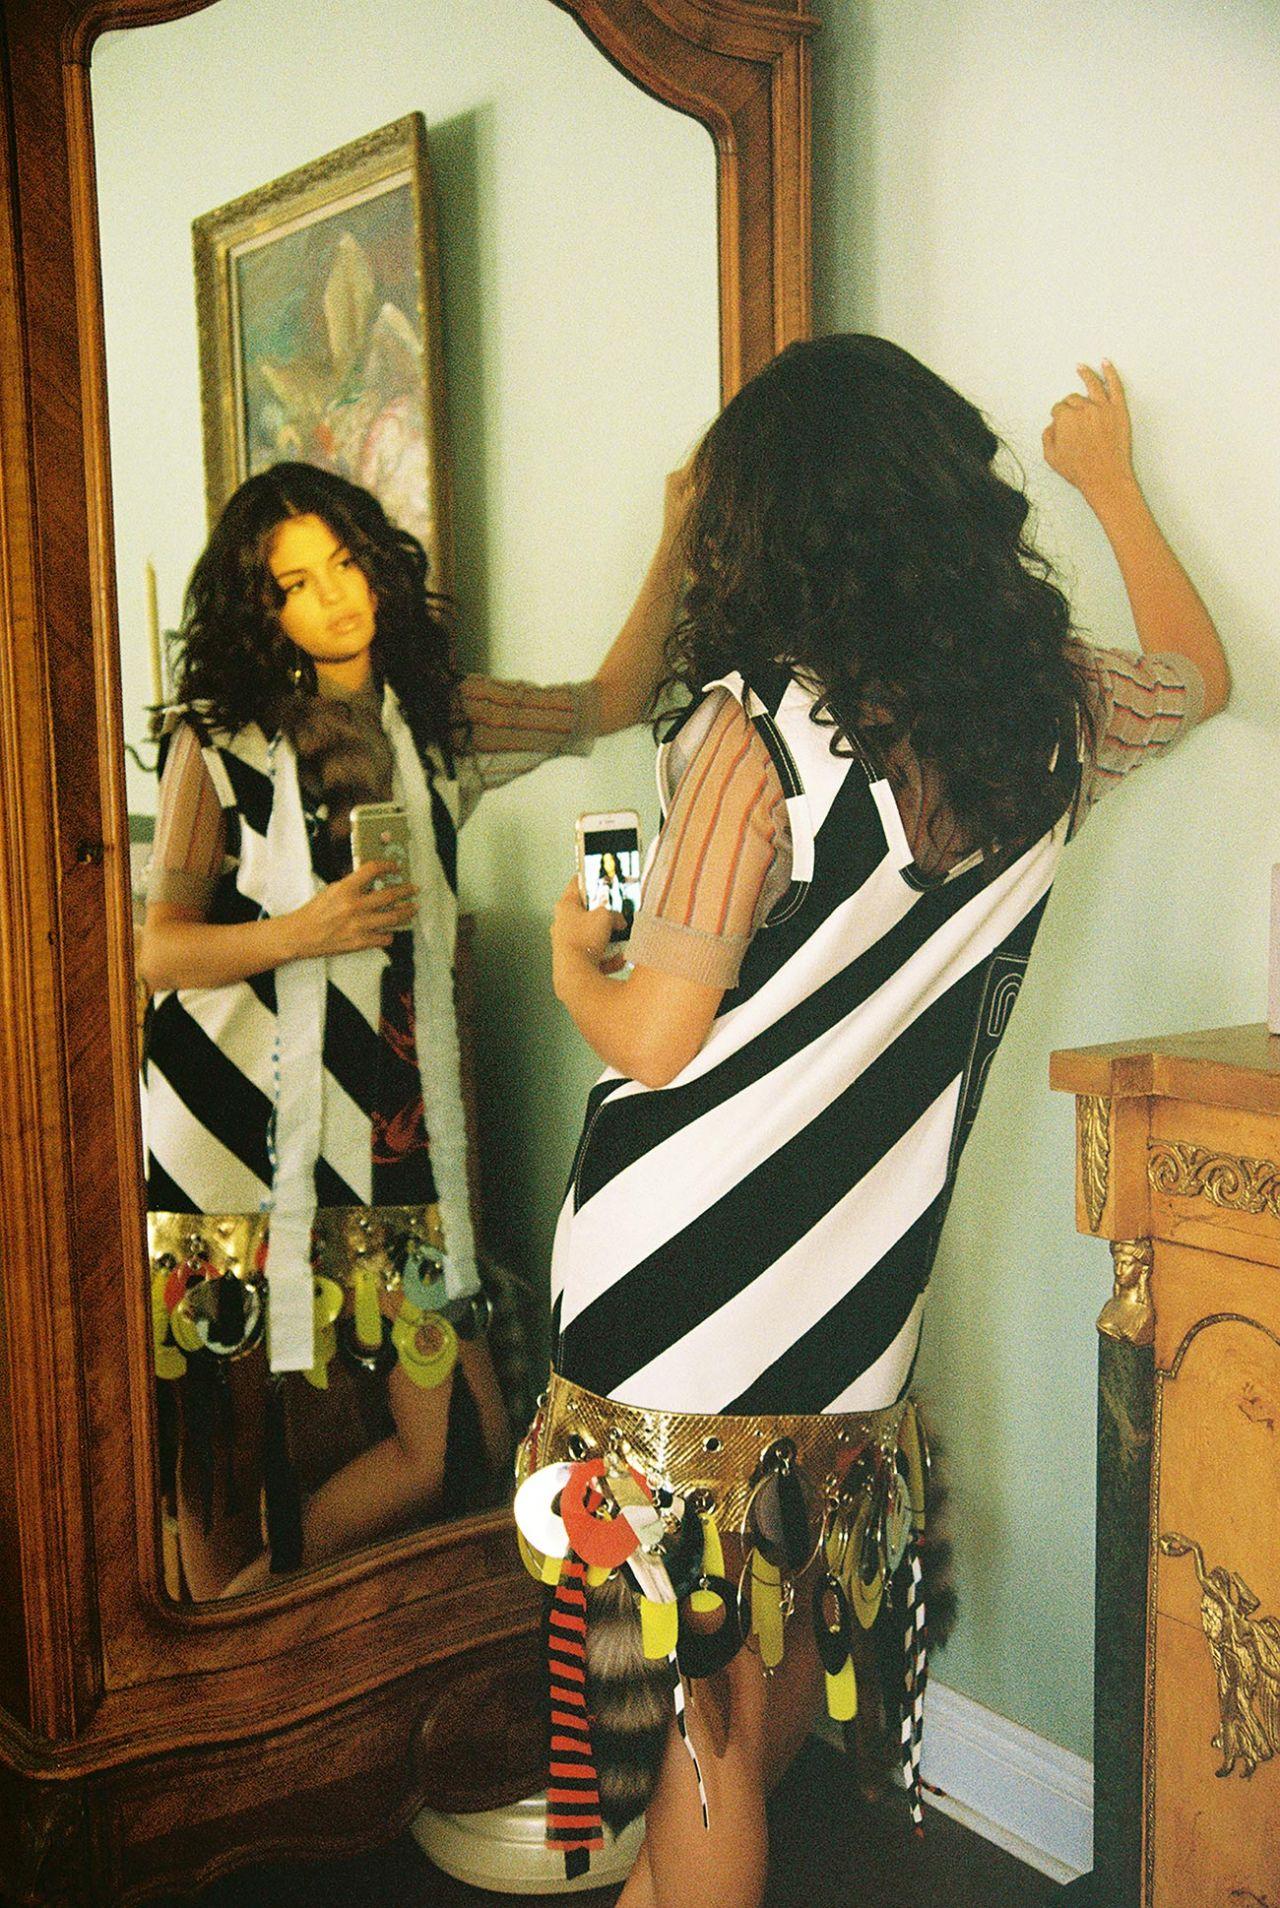 Paris In The Fall Wallpaper Selena Gomez Wonderland Magazine August 2015